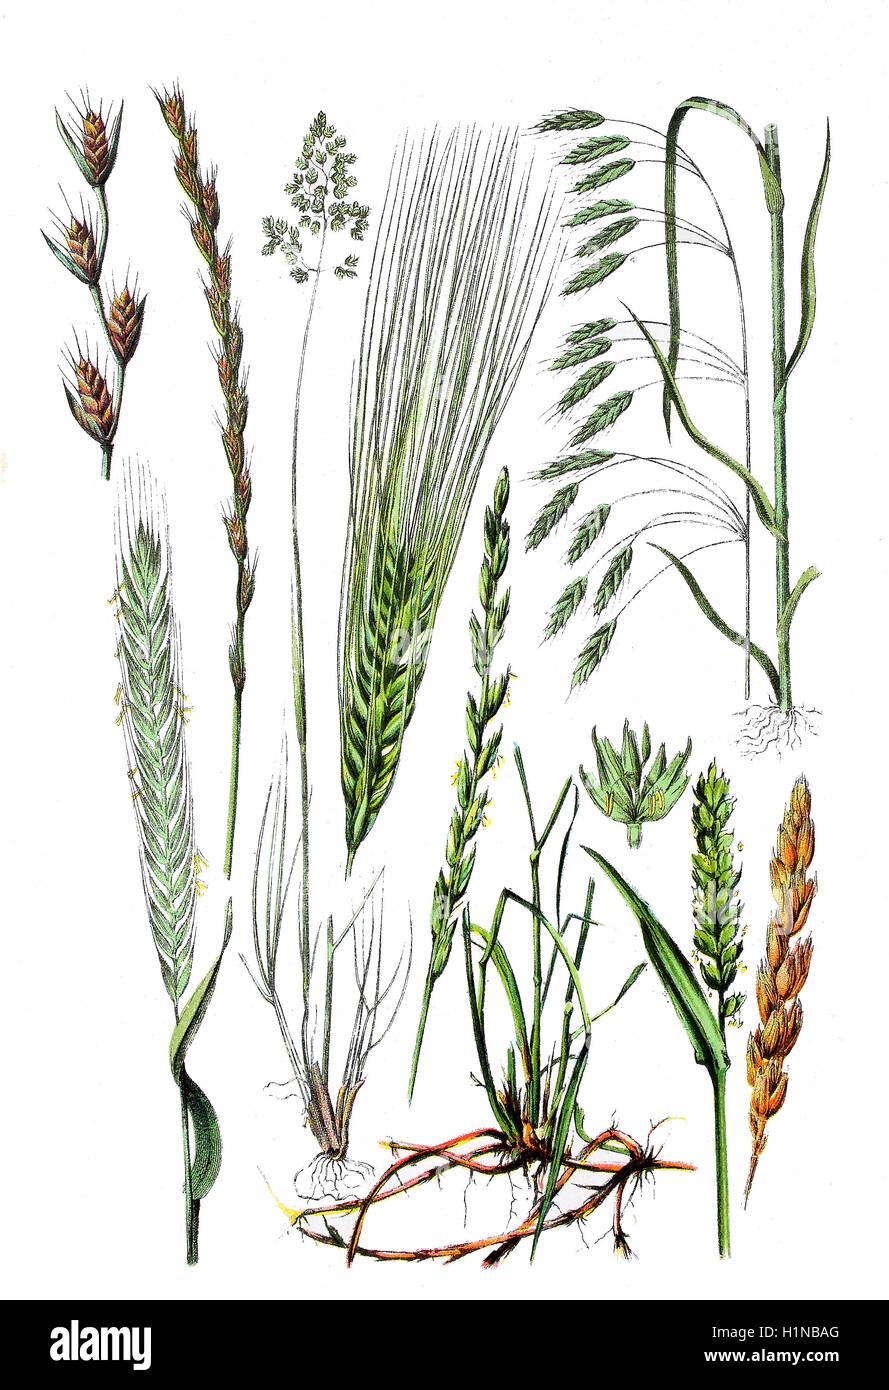 darnel, poison darnel, darnel ryegrass, Lolium temulentum (1. und 2. left top), Rye, Secale cereale (bottem left), - Stock Image